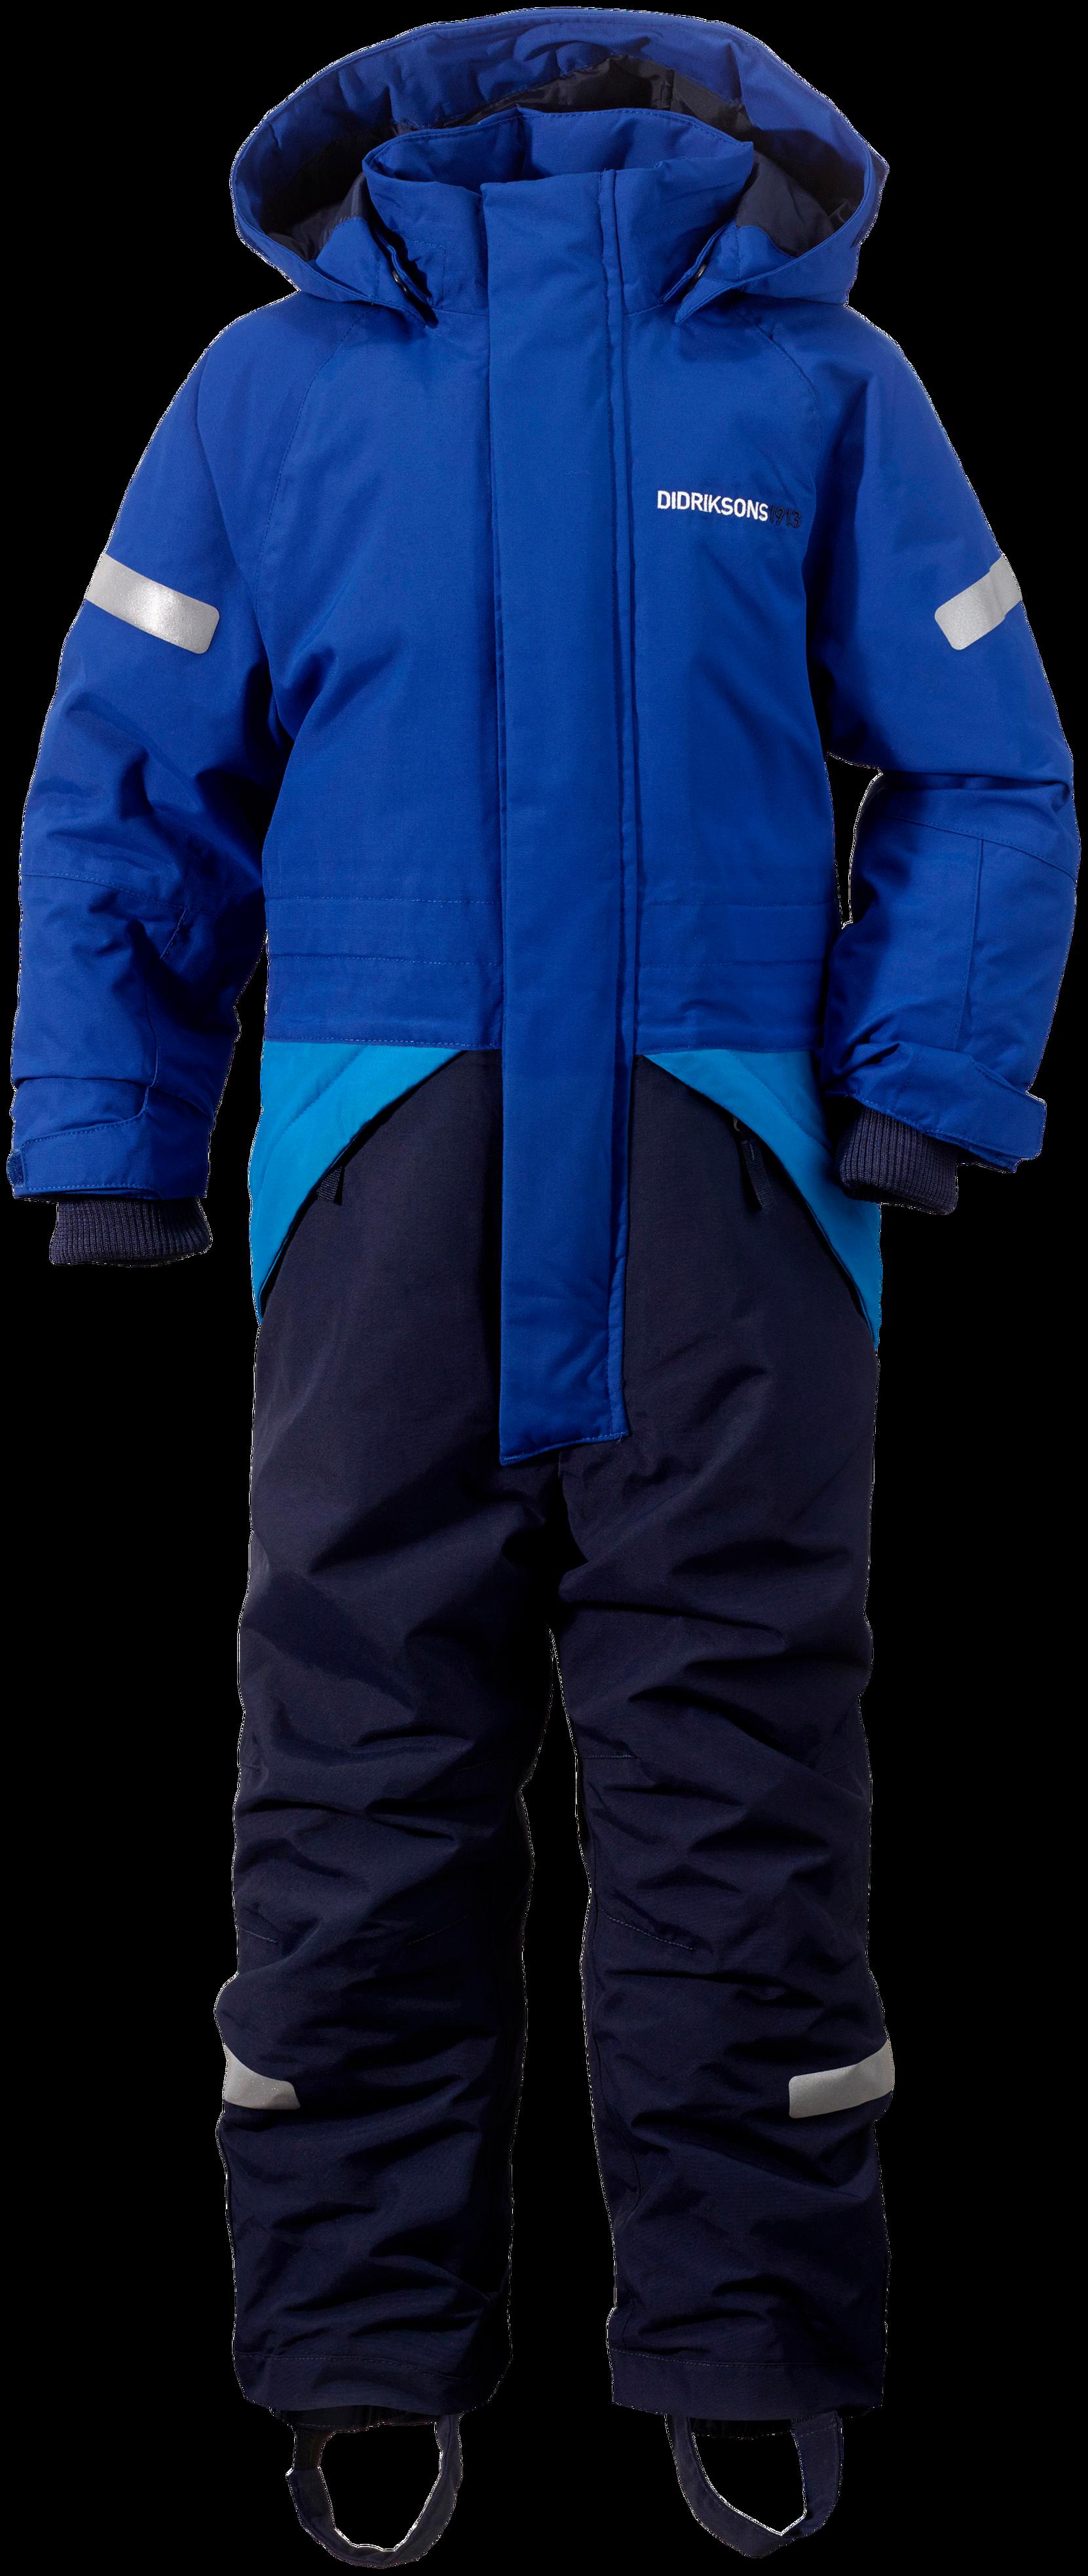 Tjarve kids -talvihaalari